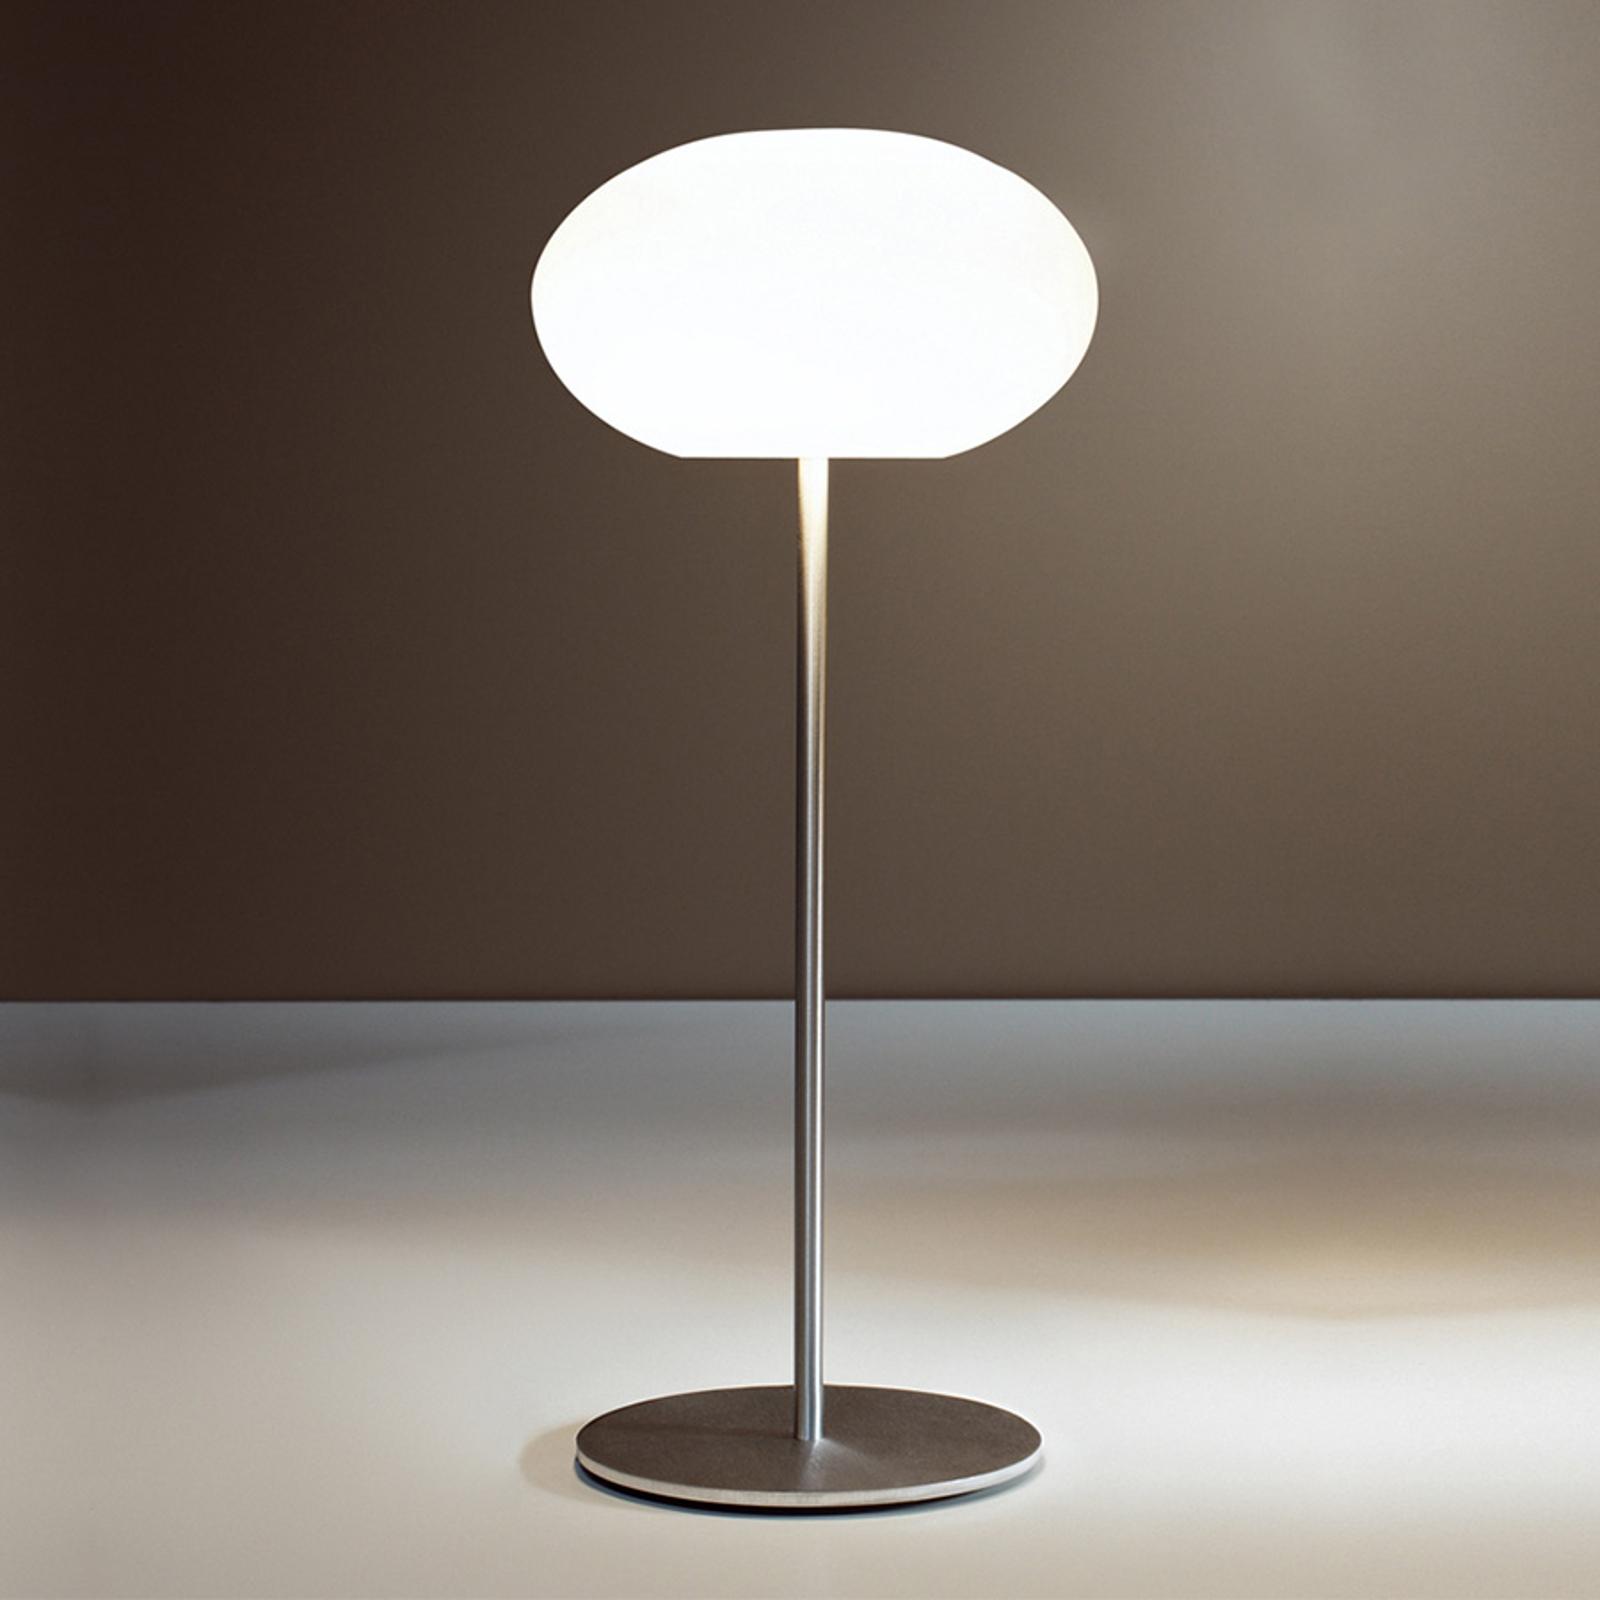 Casablanca Aih lampa stołowa Ø19cm biała lśniąca